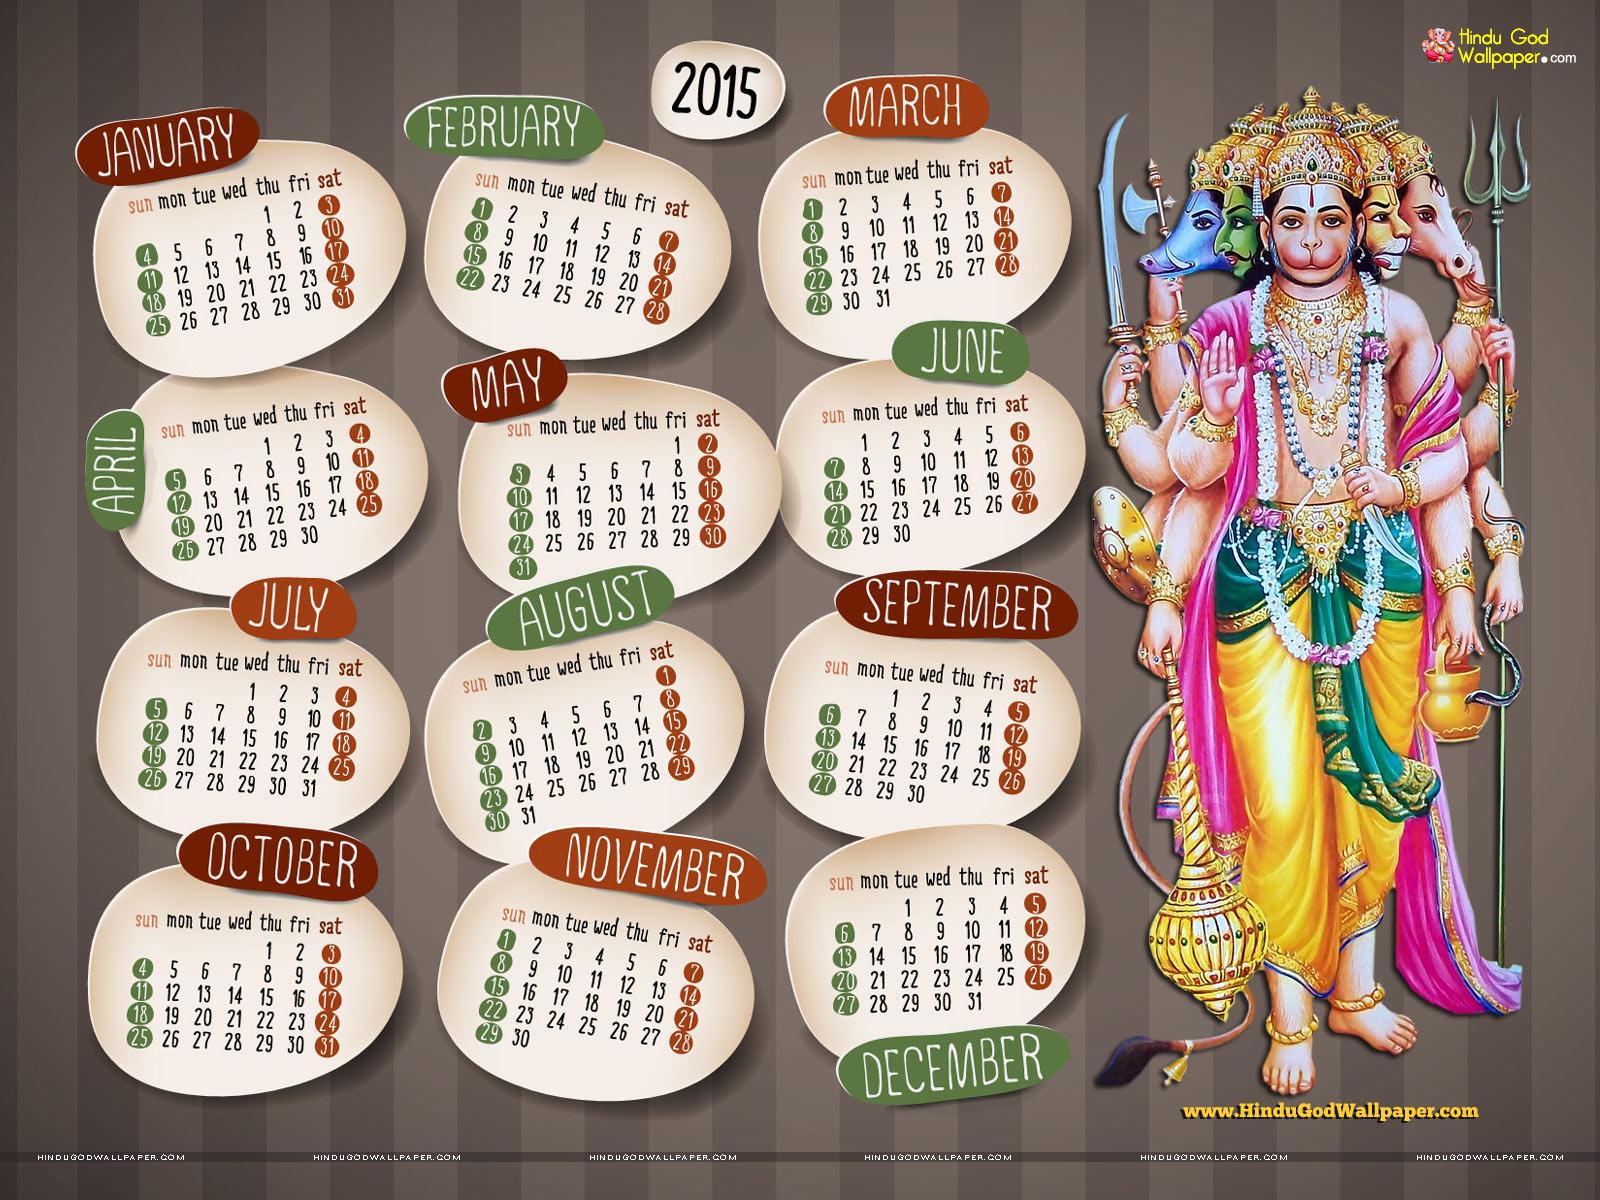 Desktop Calendar 2015 Wallpaper HD Download 1600x1200